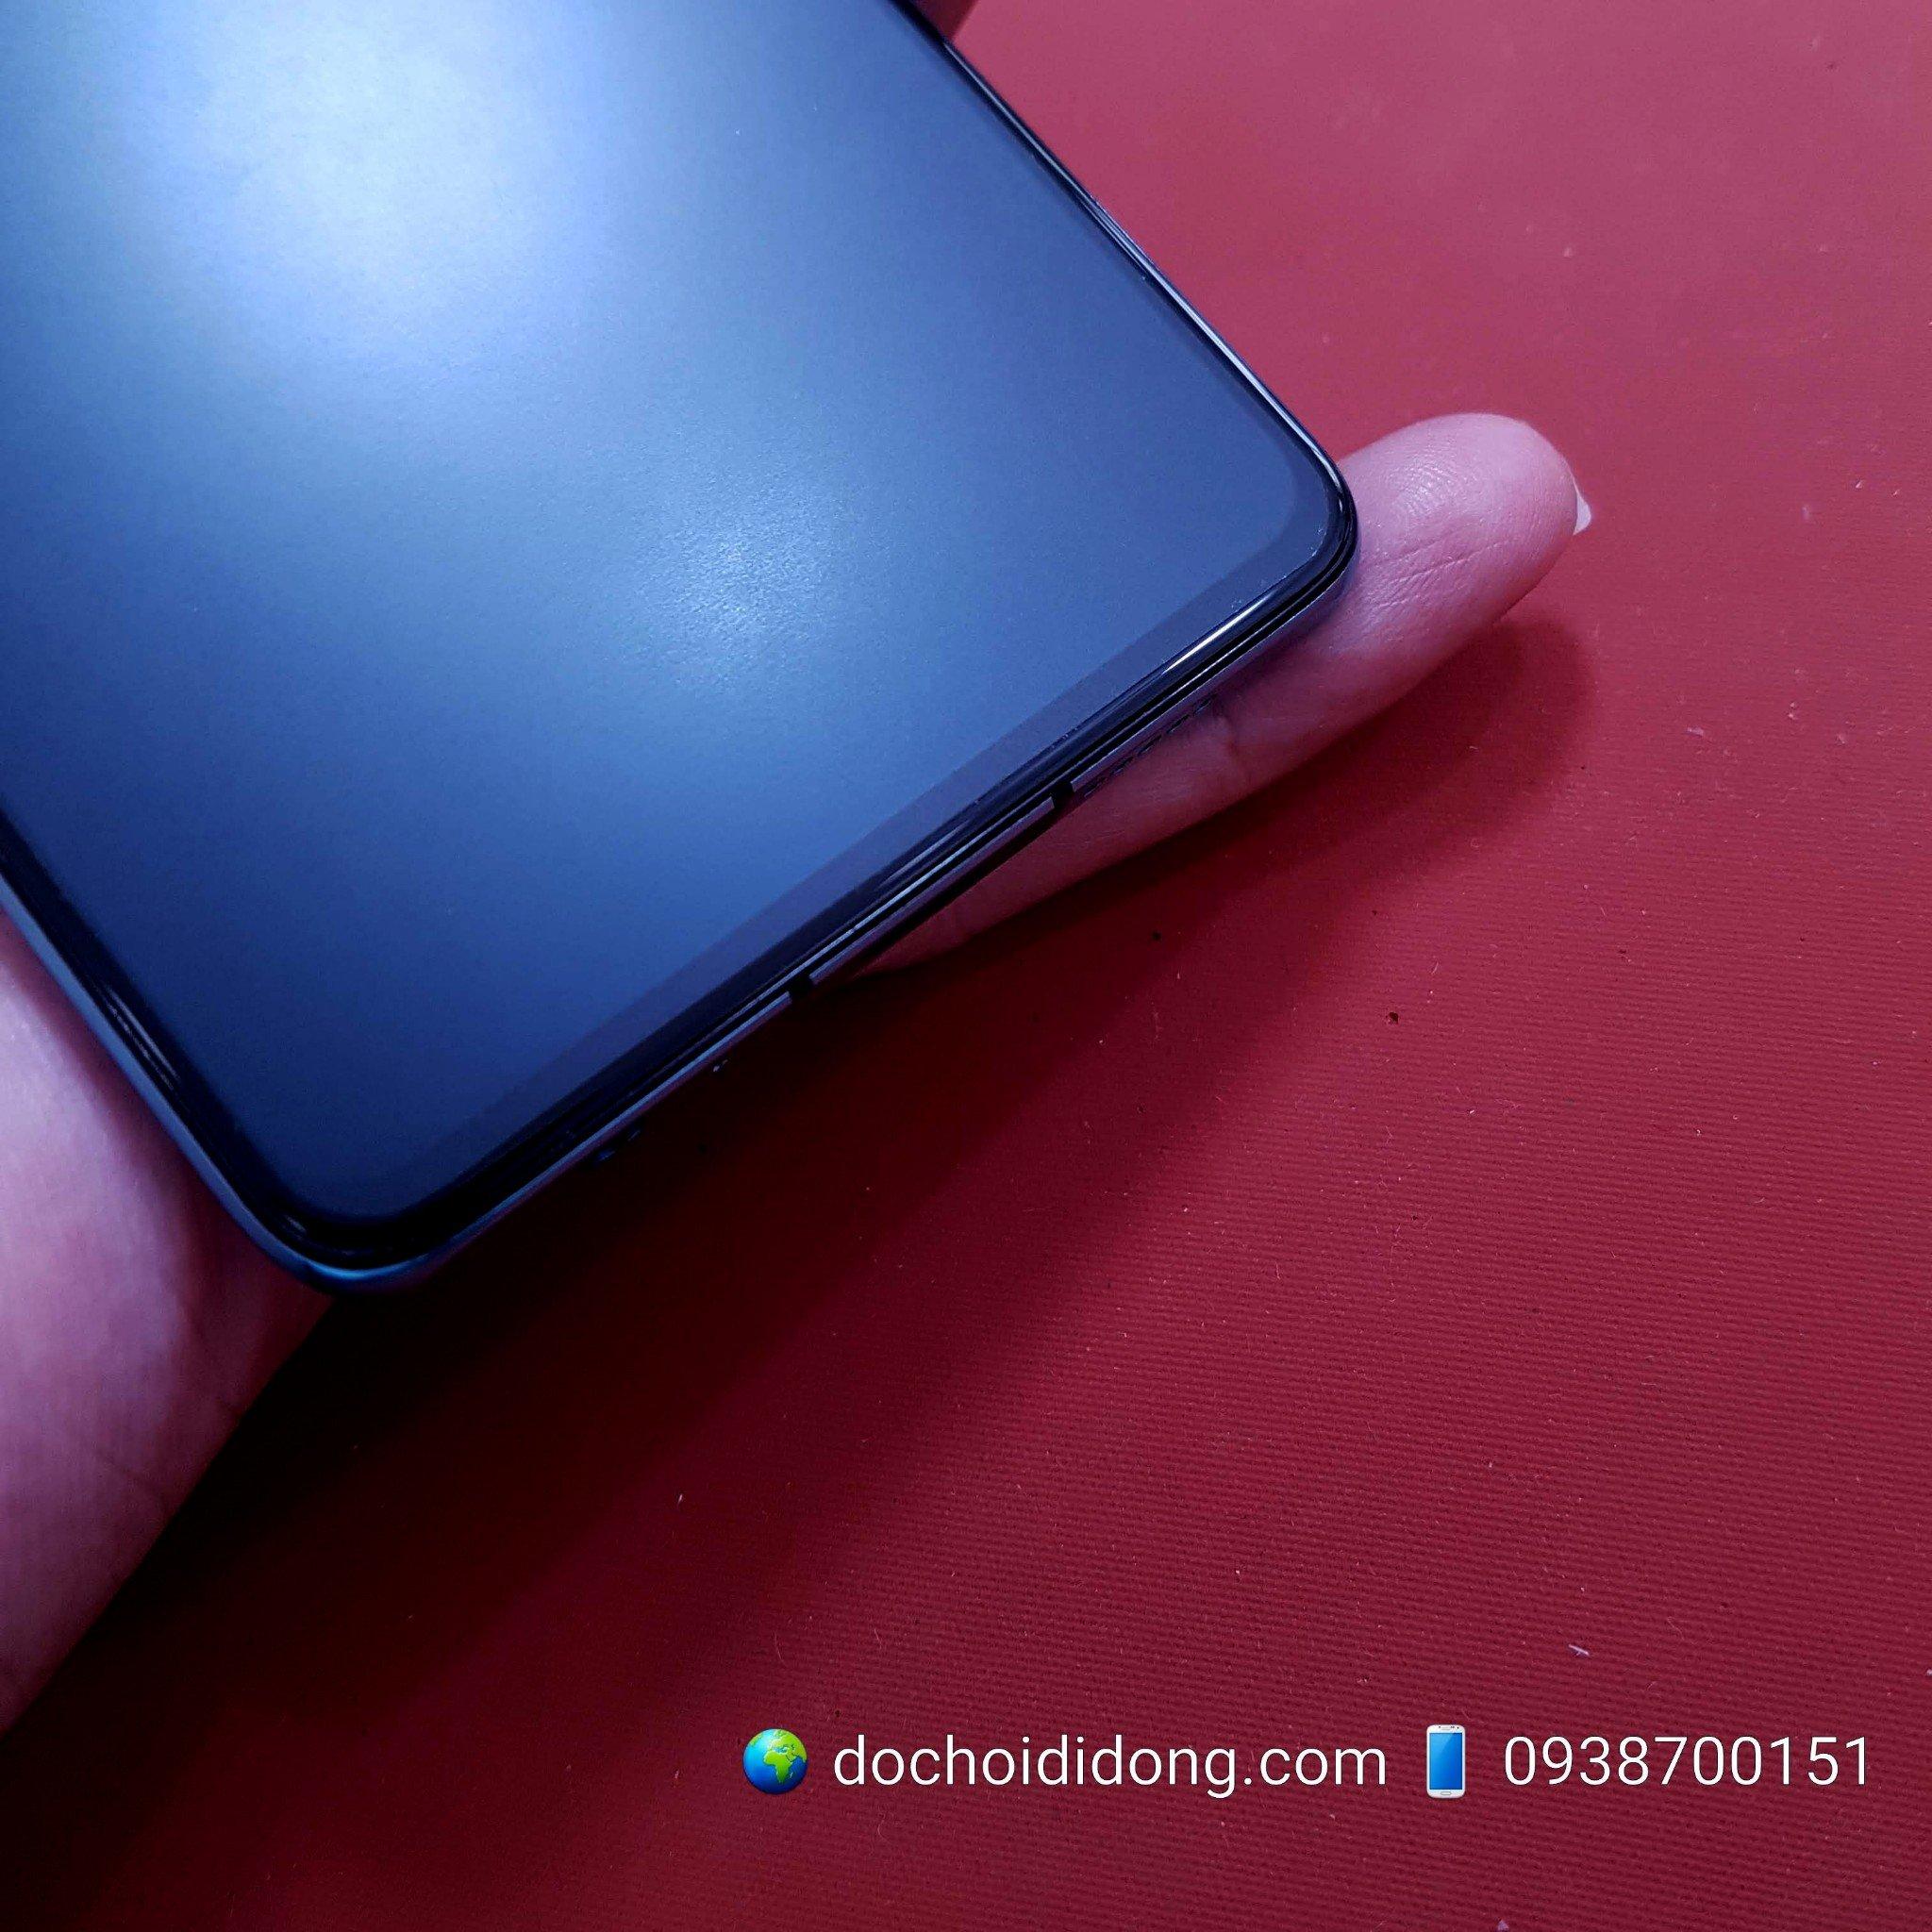 mieng-dan-man-hinh-nham-huawei-p30-matte-flexible-deo-chong-van-tay